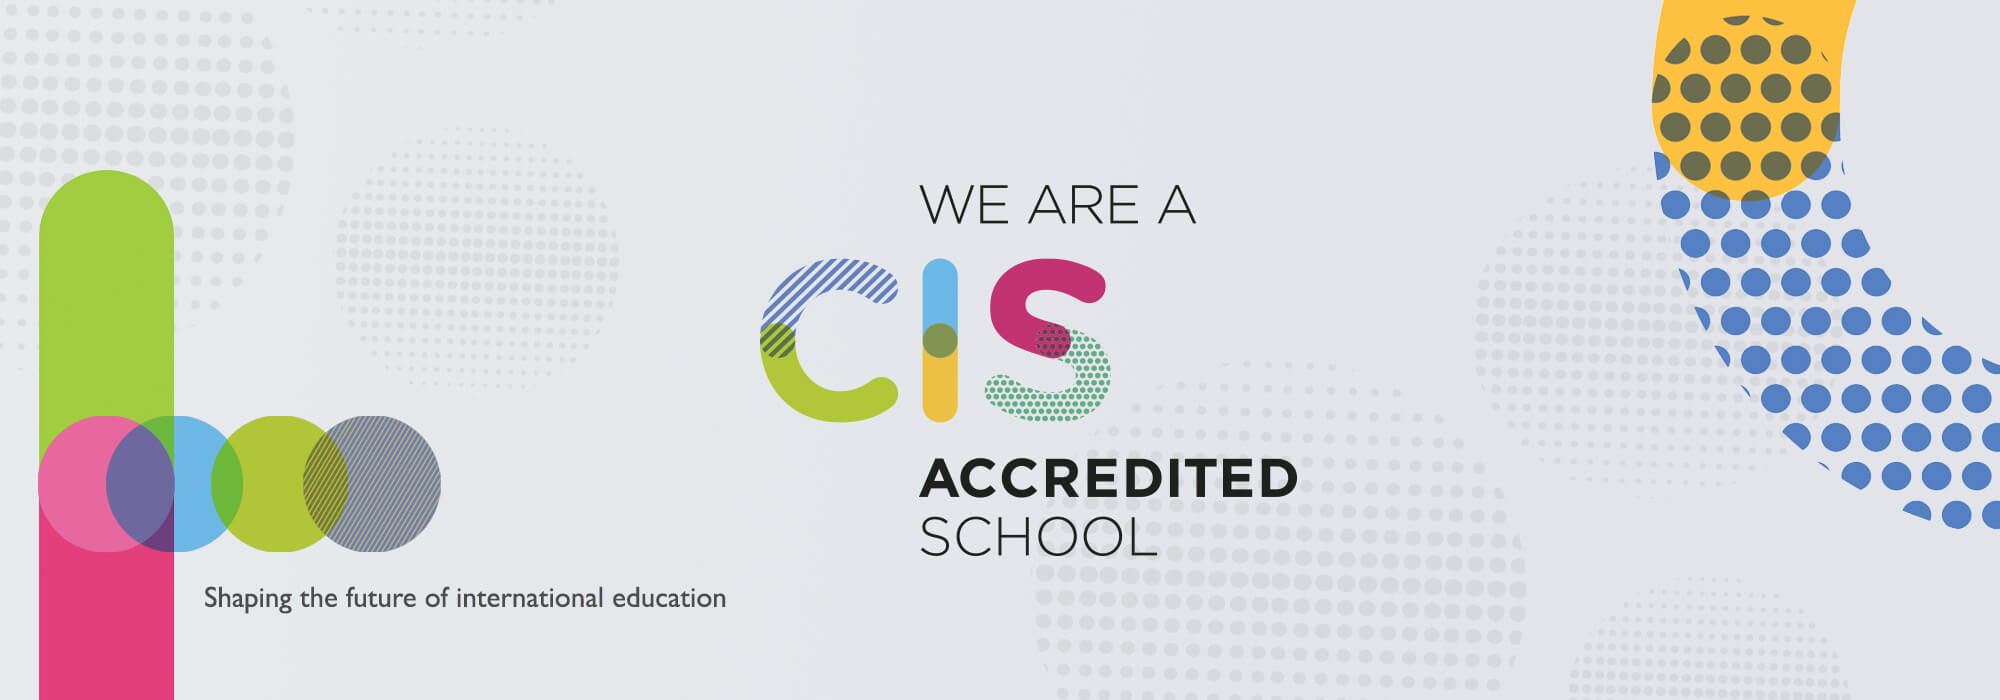 Al Resala Bilingual School Kuwait - CIS Accredited School in Kuwait